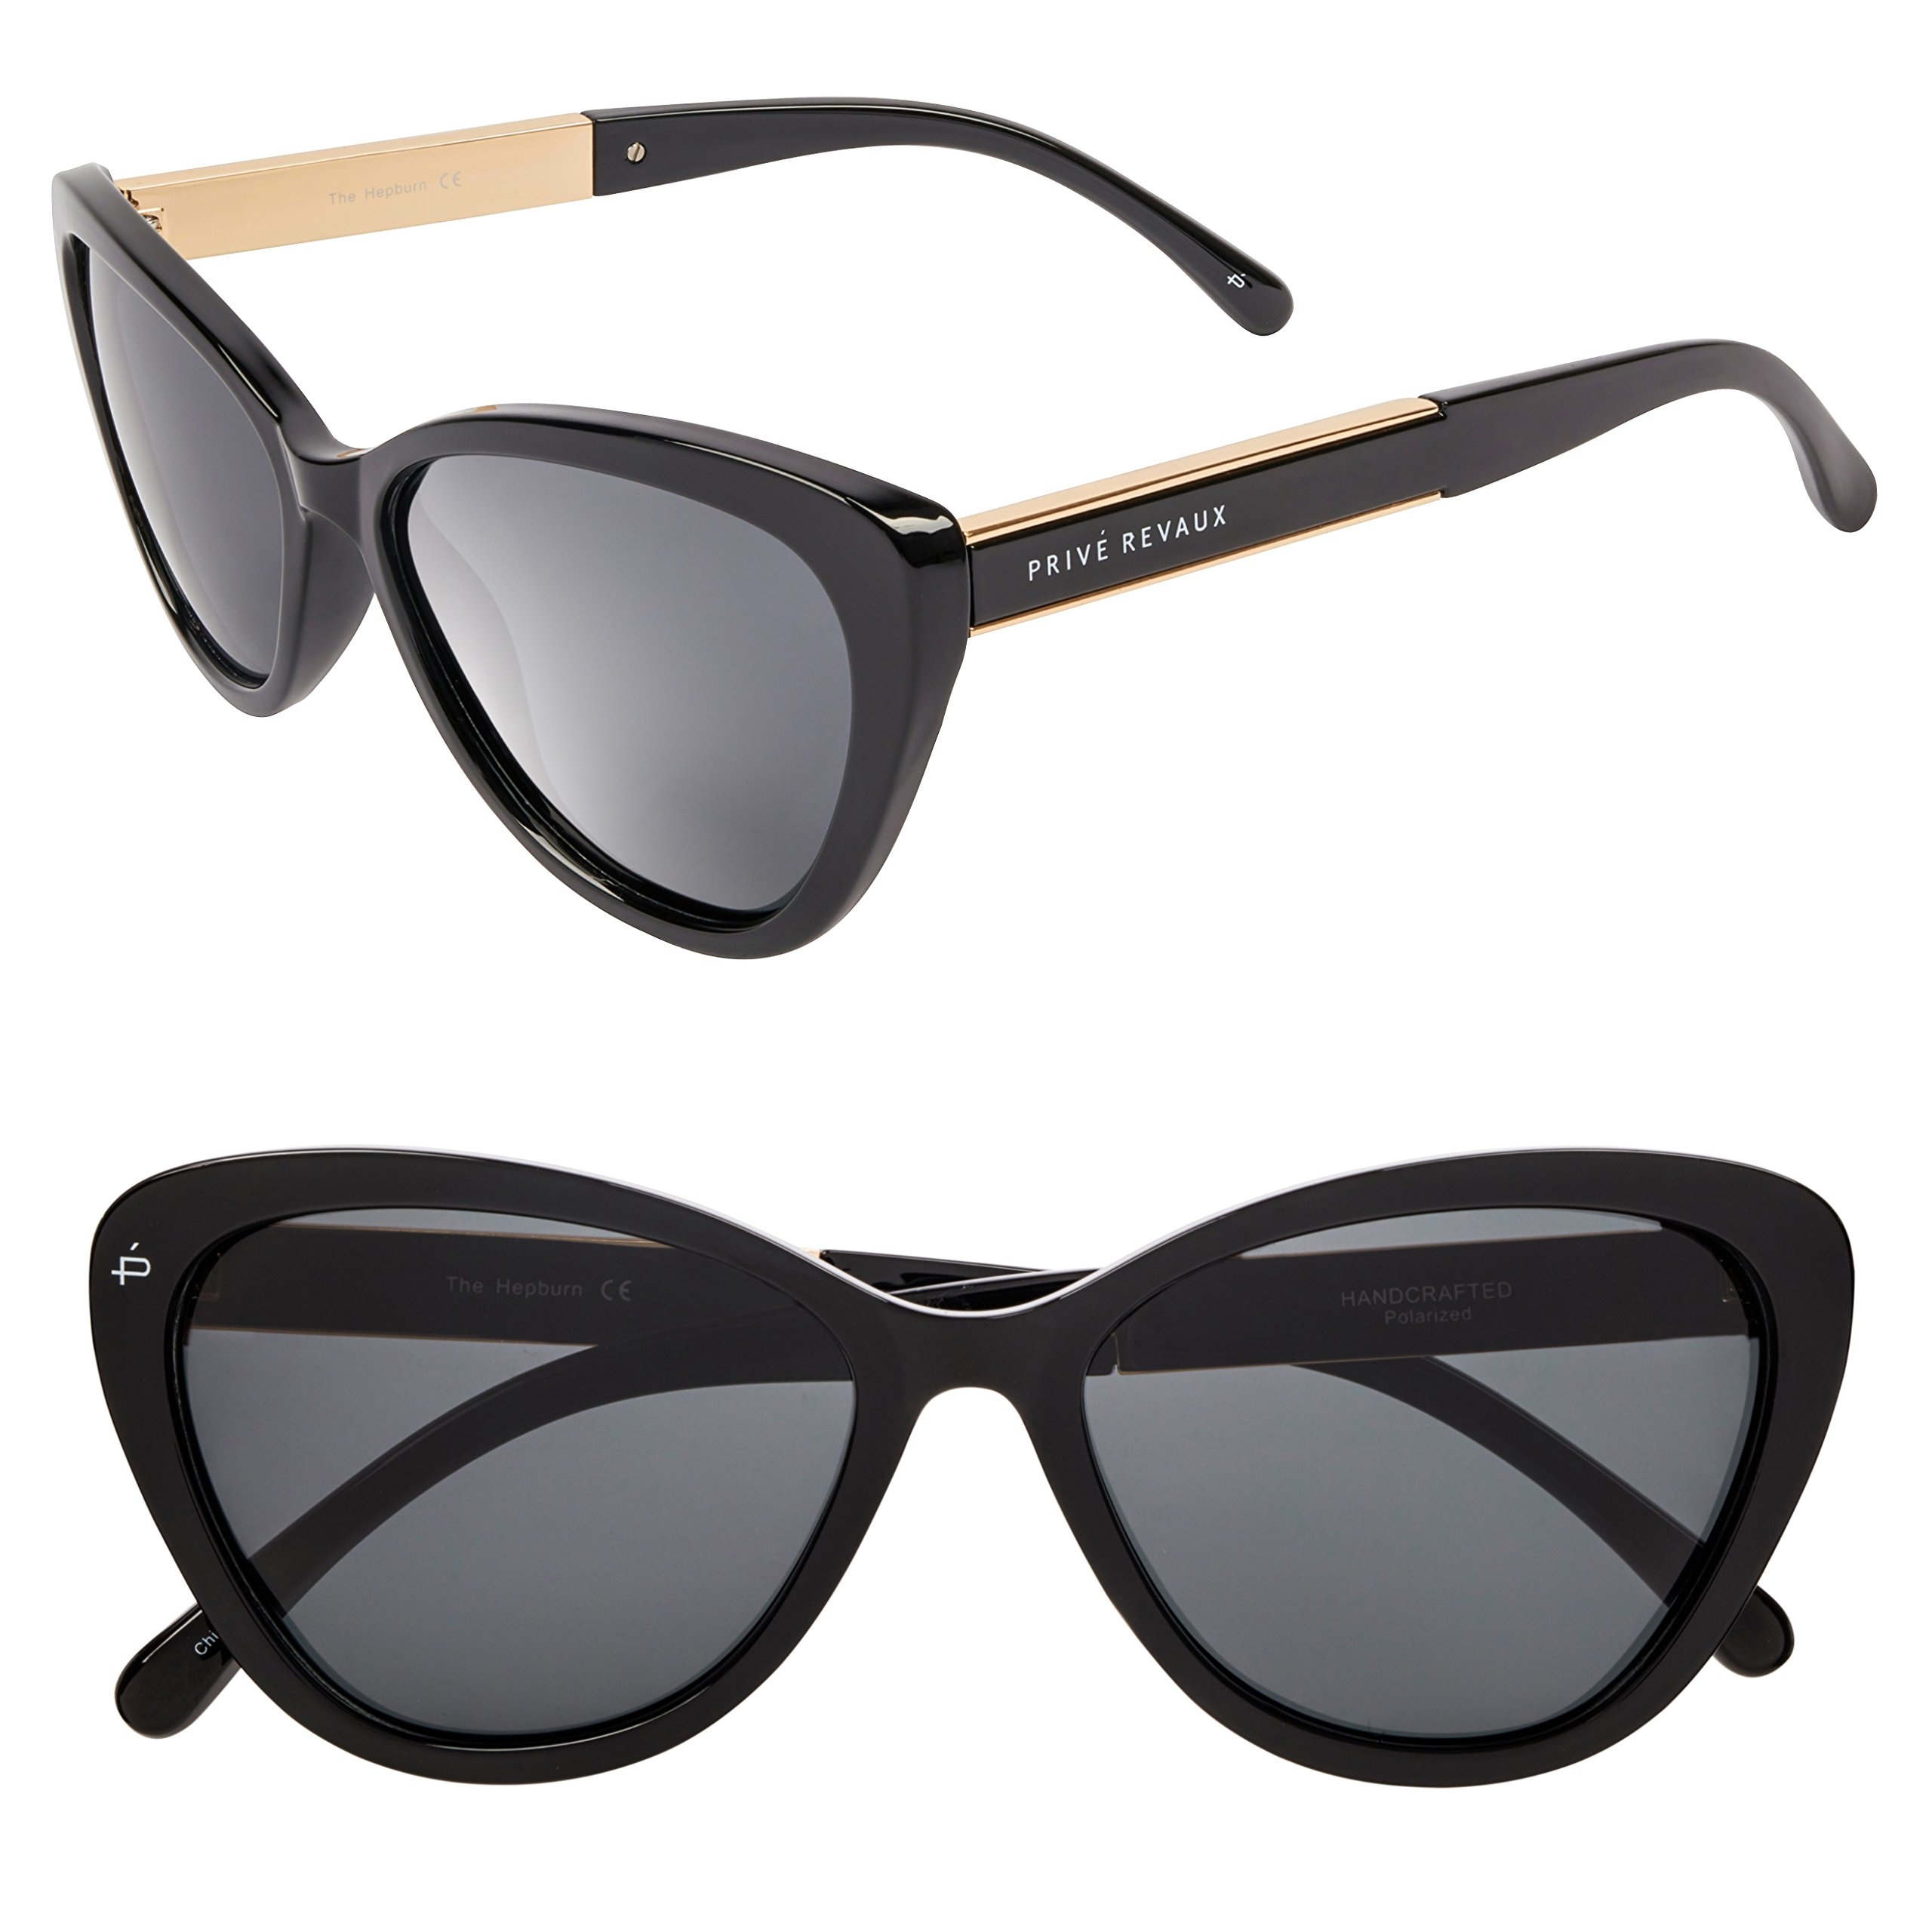 PRIVÉ REVAUX ICON Collection''The Hepburn'' Handcrafted Designer Polarized Retro Cat-Eye Sunglasses (Black) Affordable Designer Men's Sunglasses or Women's Sunglasses, Endorsed by Jamie Foxx